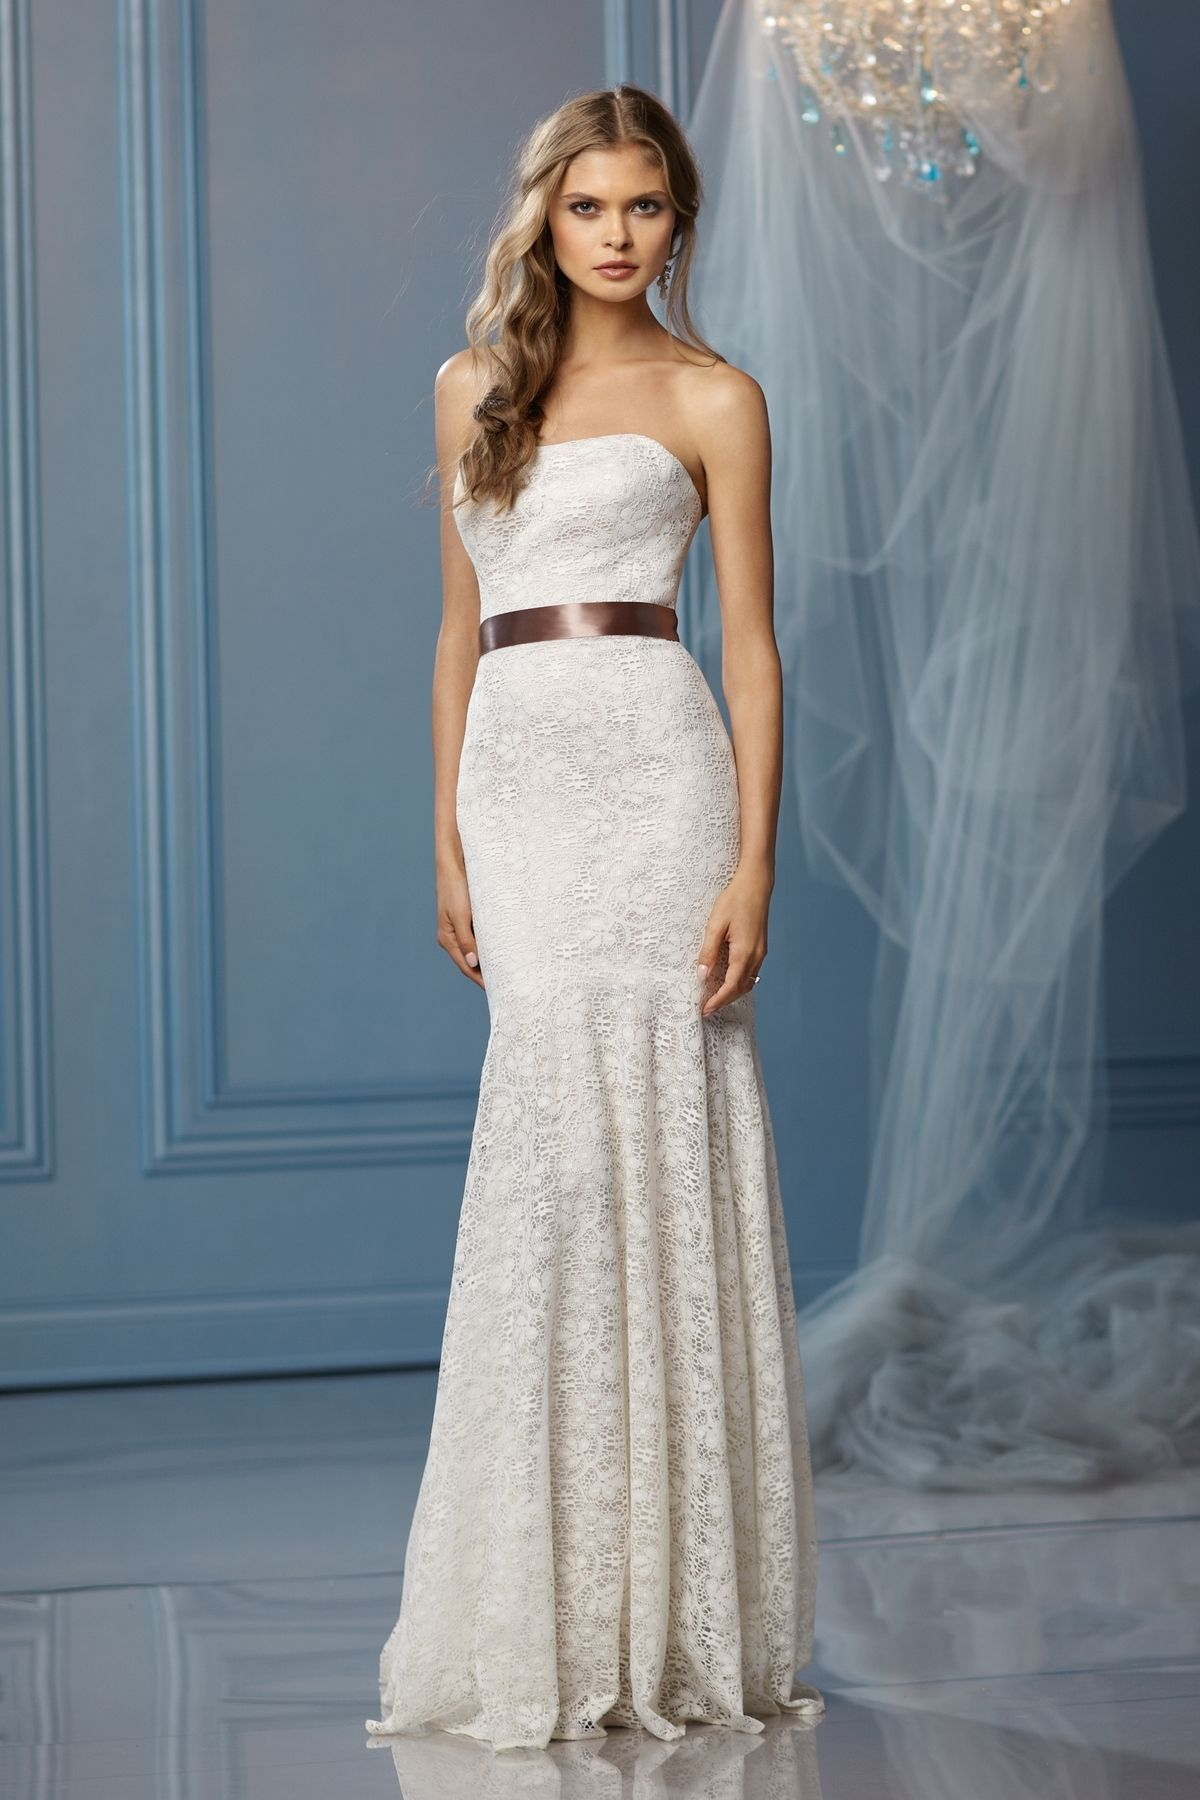 Outstanding Simple Wedding Dresses Under 200 Frieze - All Wedding ...